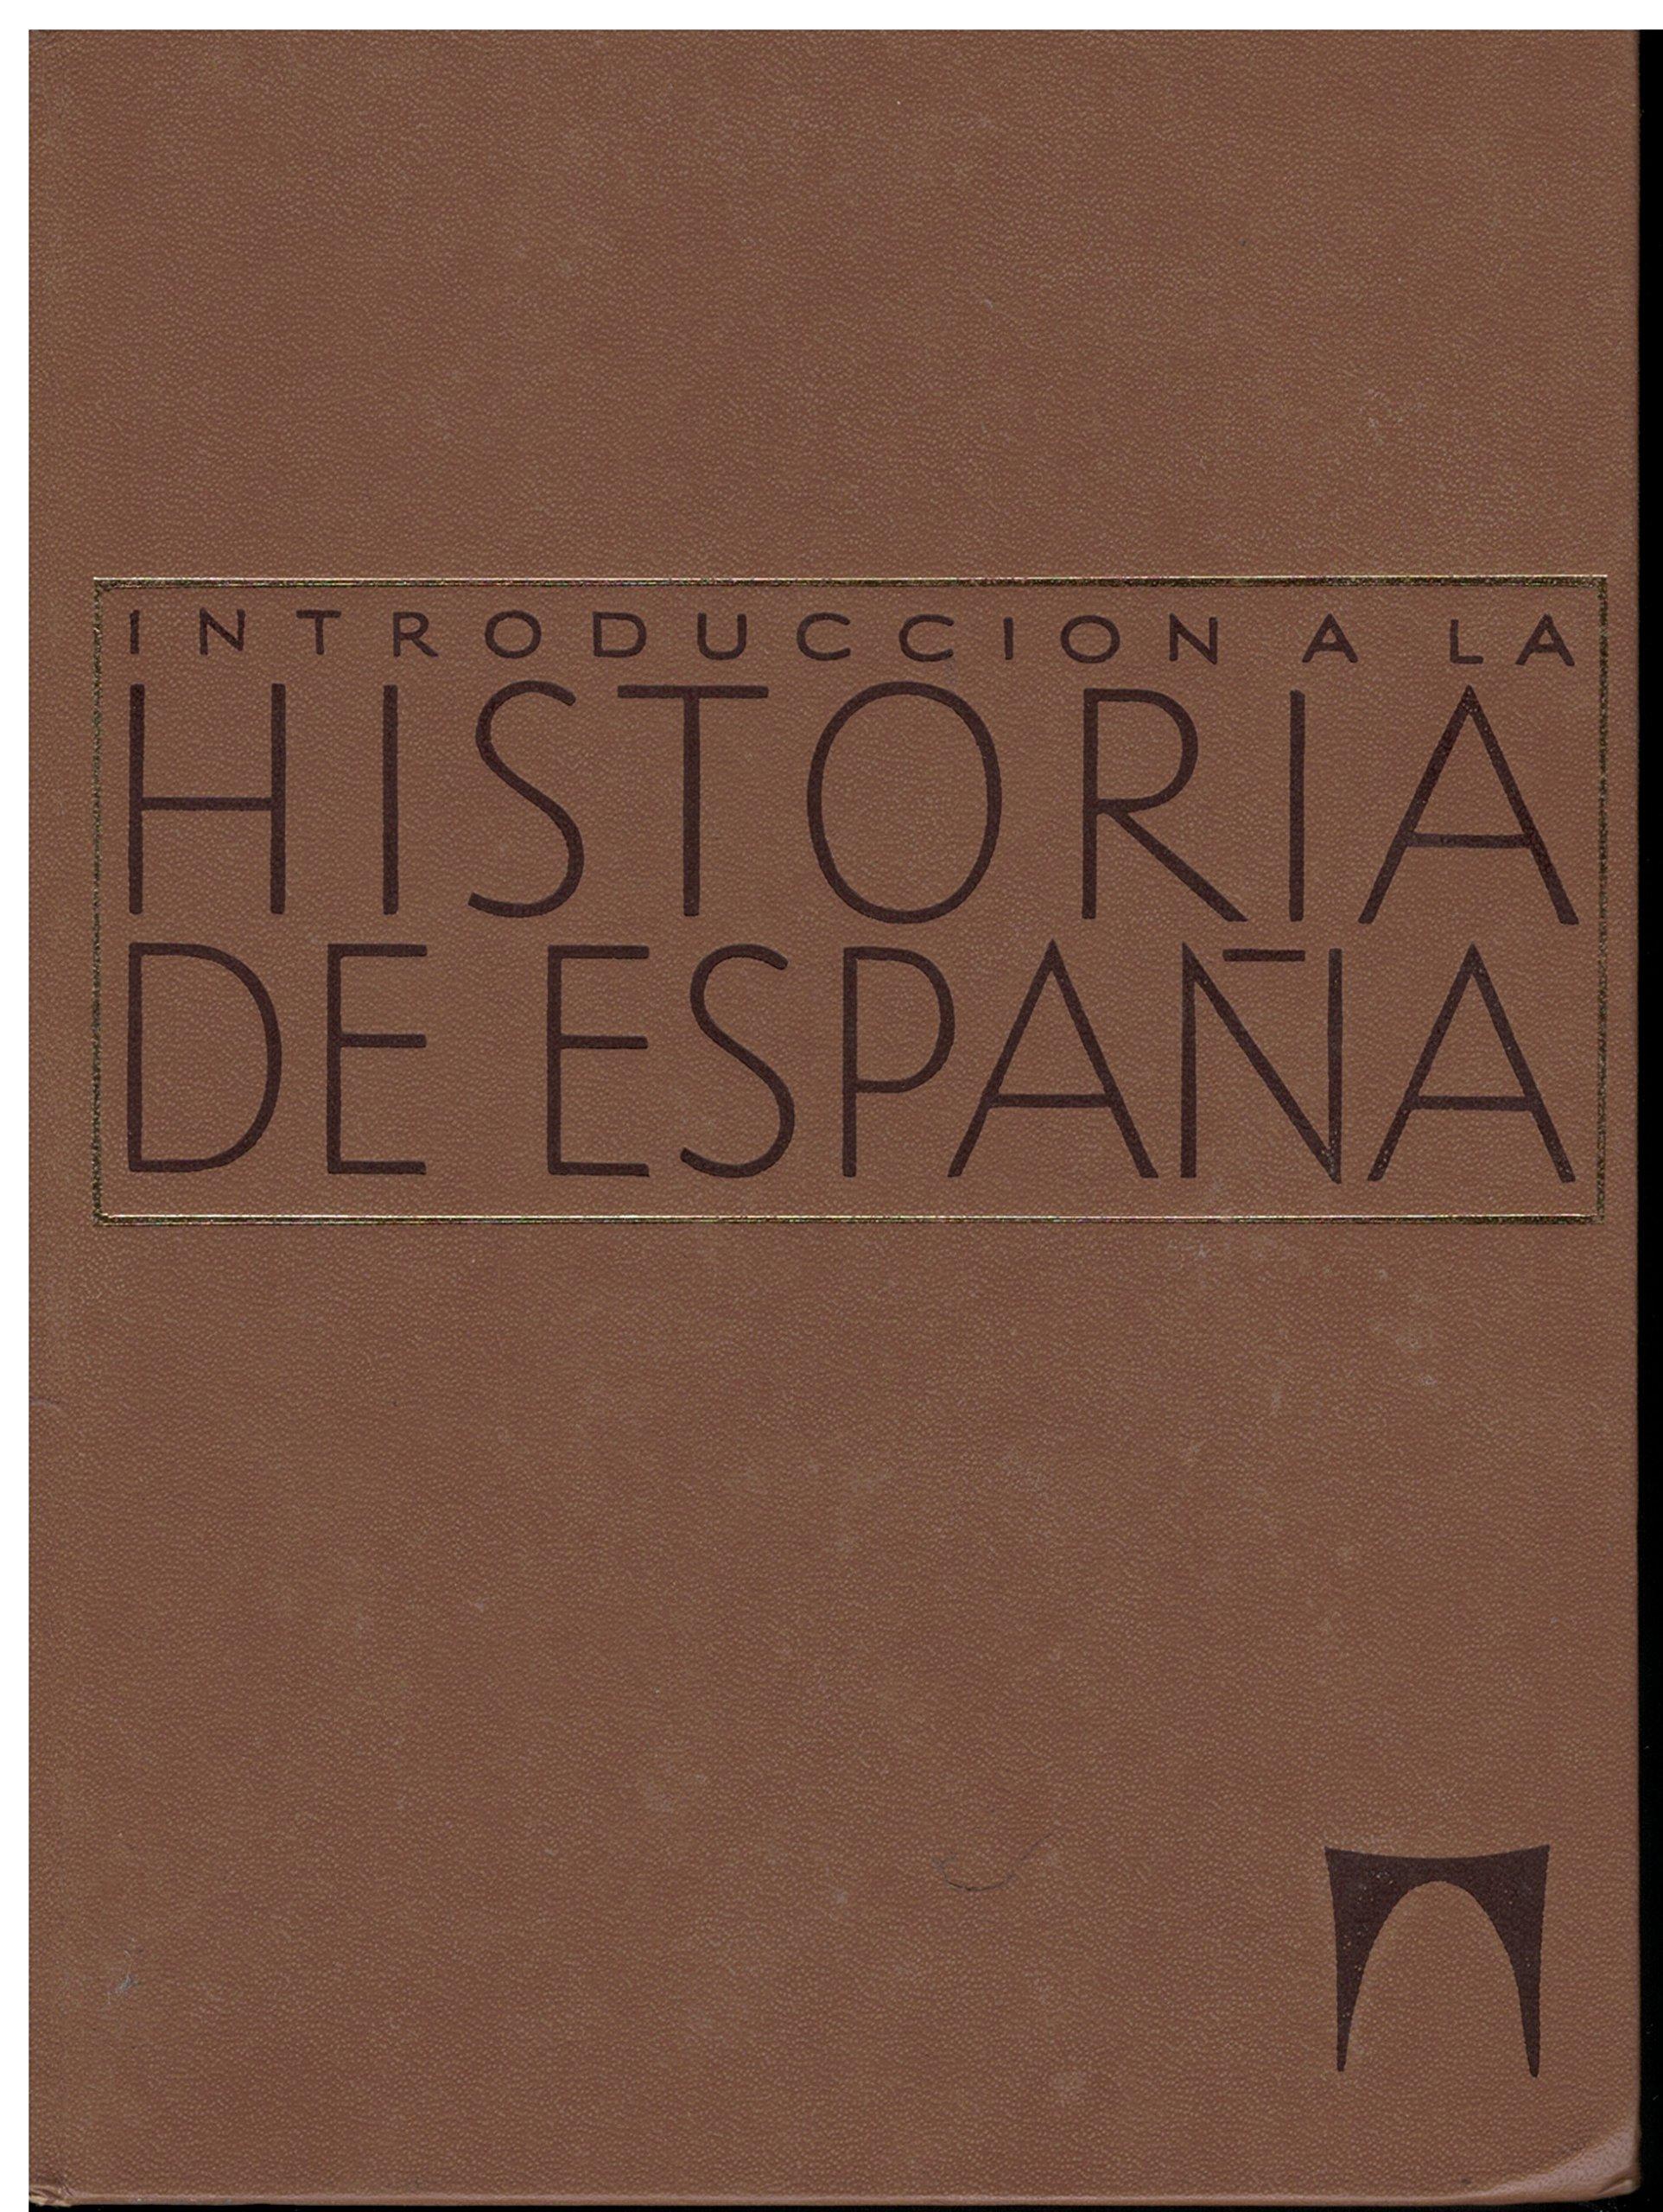 Historia de España: Amazon.es: Terrero, Jose, Regla, J.: Libros